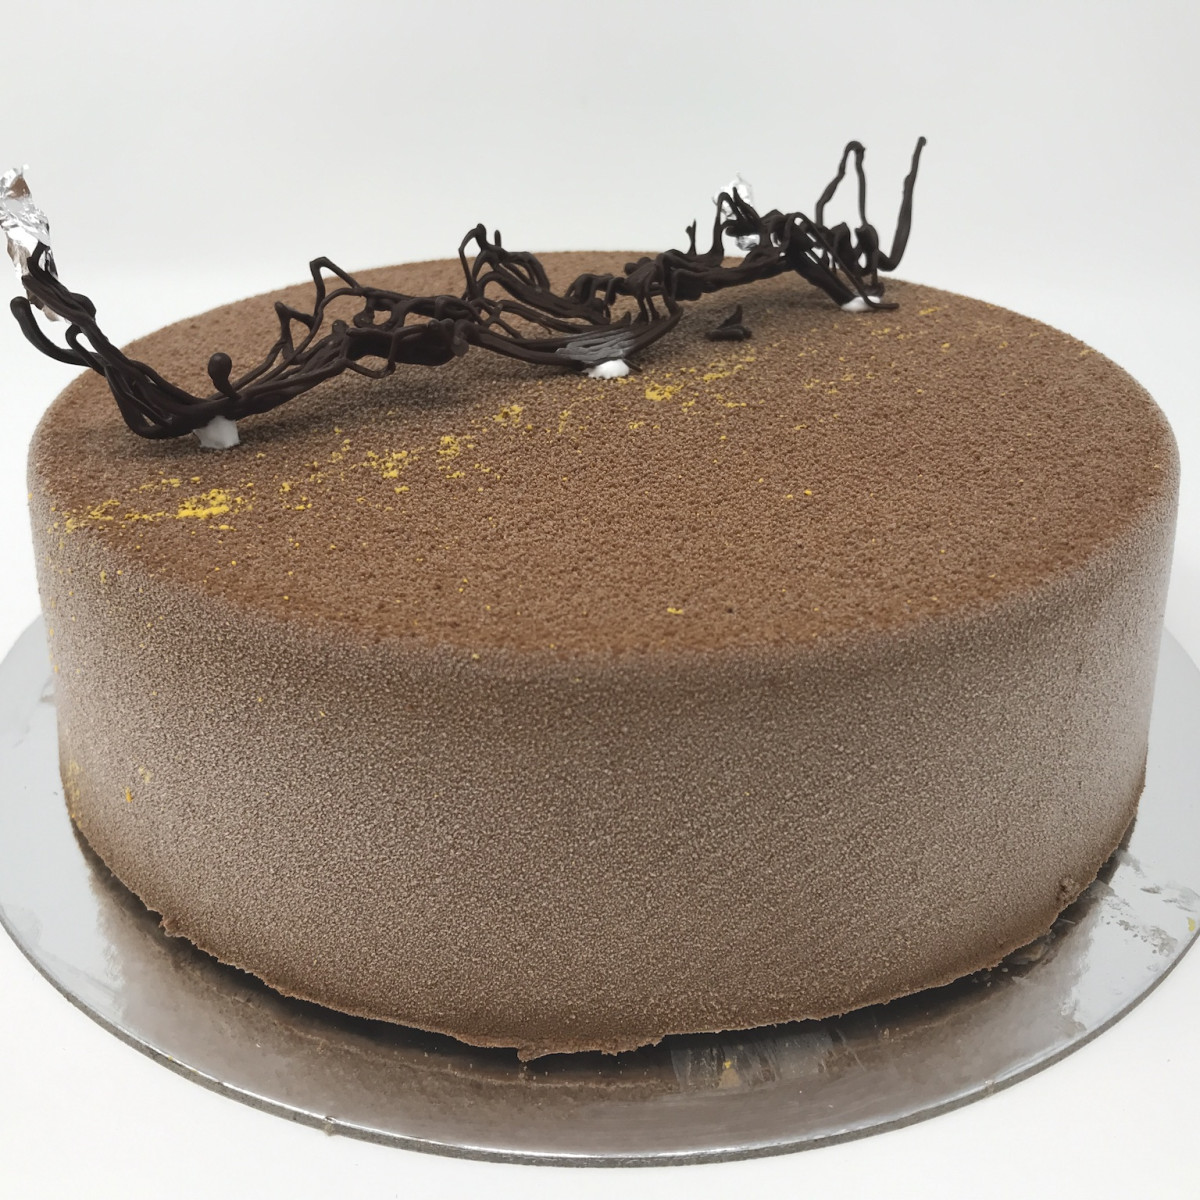 Cloud 10 Creamery dark chocolate with banana cake